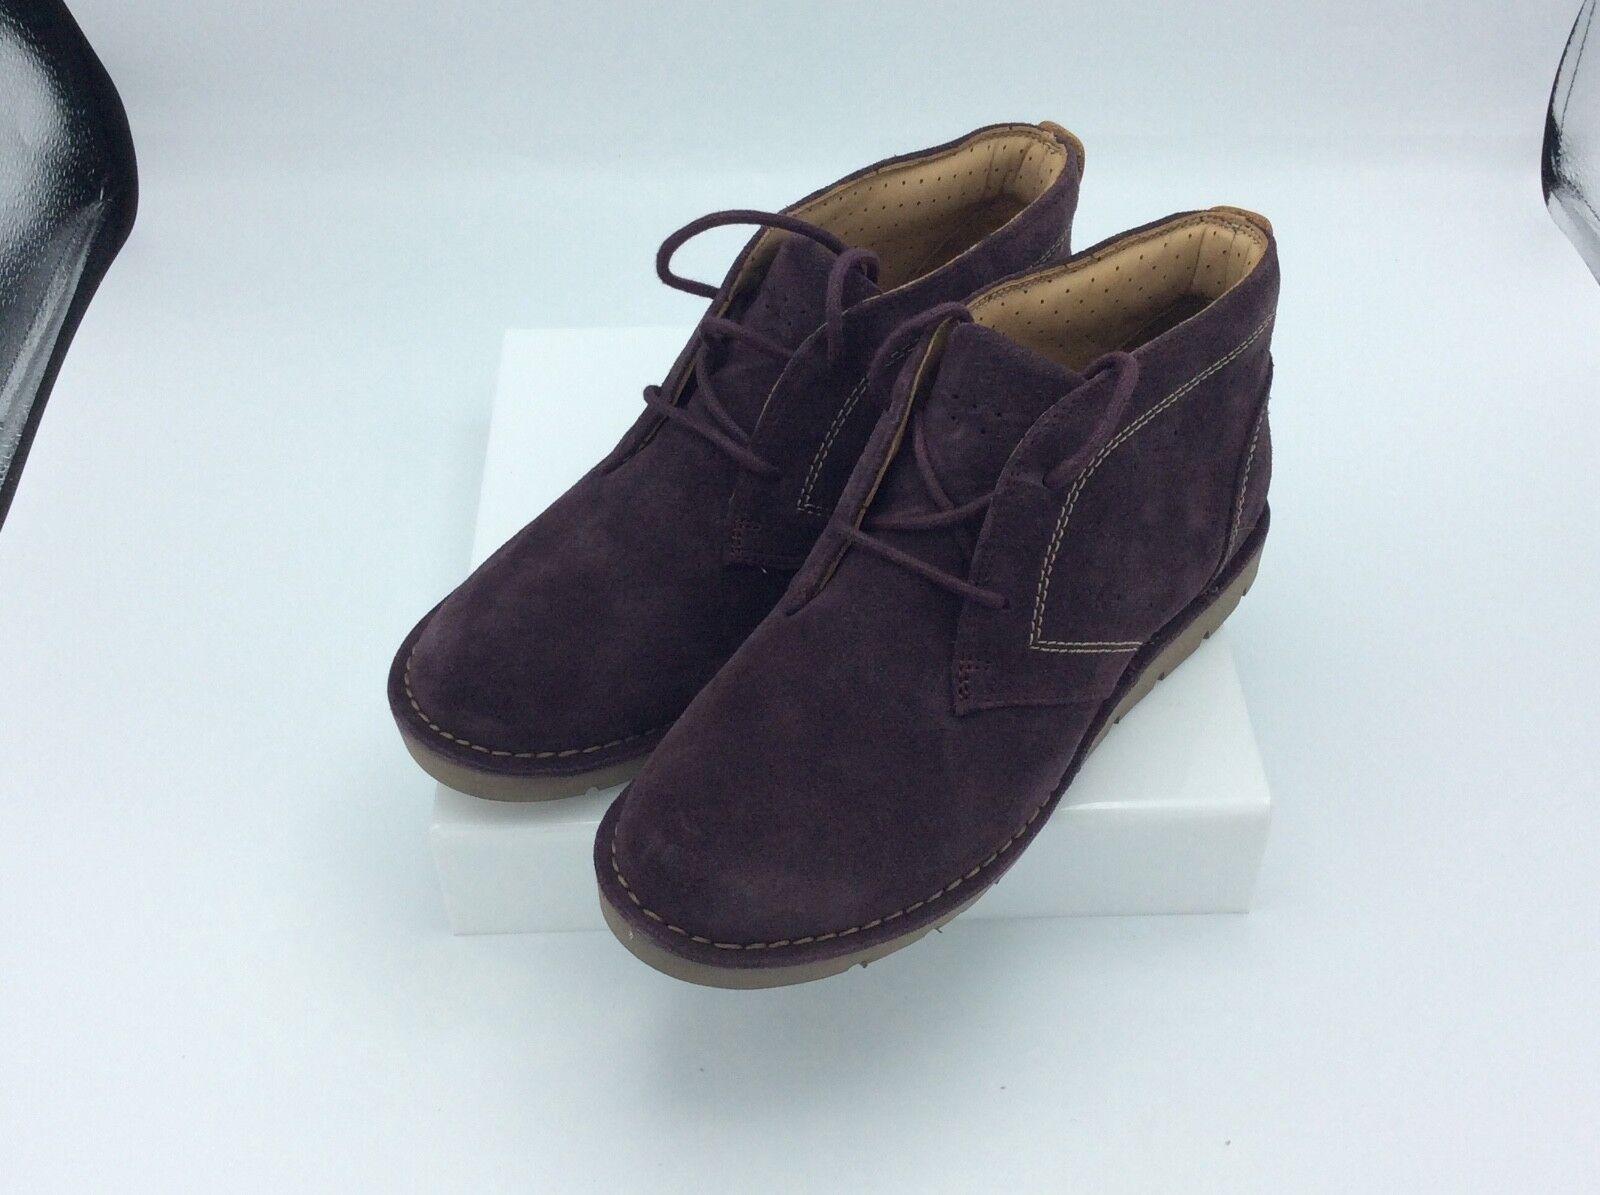 Clarks Womens Un Astin Chukka Boot Aubergine Size 6.5 M